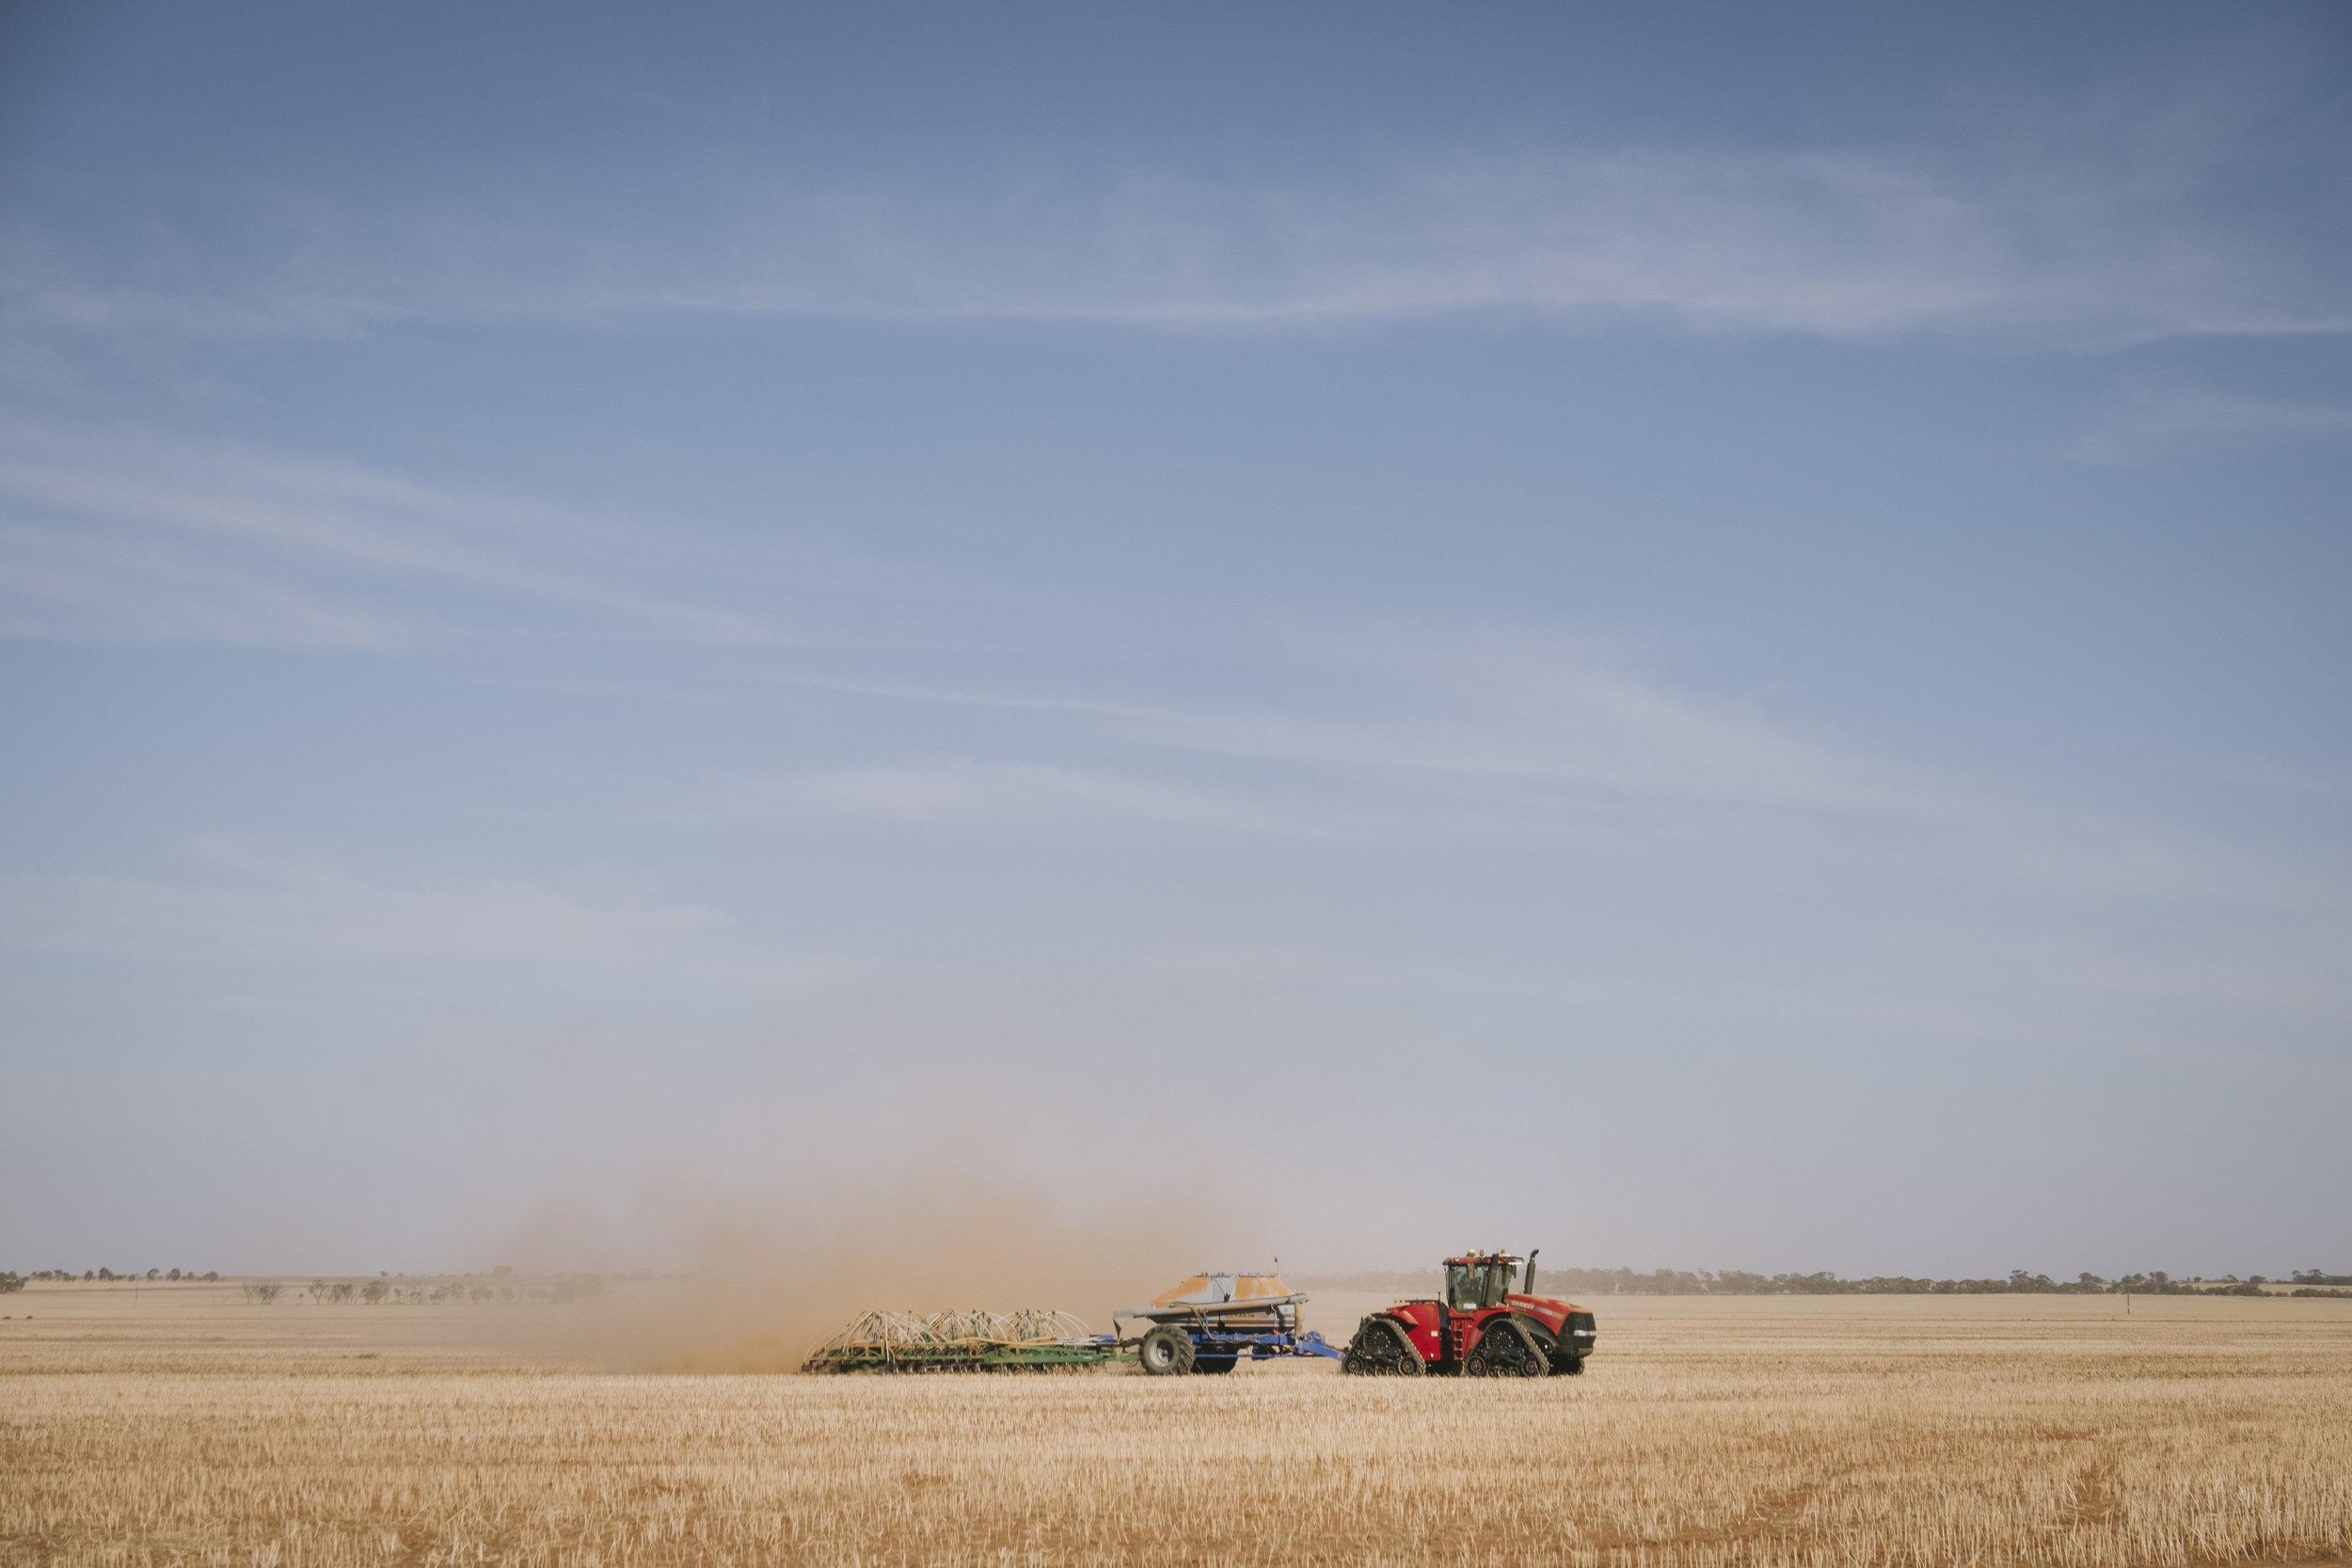 Angie Roe Photography Wheatbelt Rural Farm Landscape Seeding (10).jpg